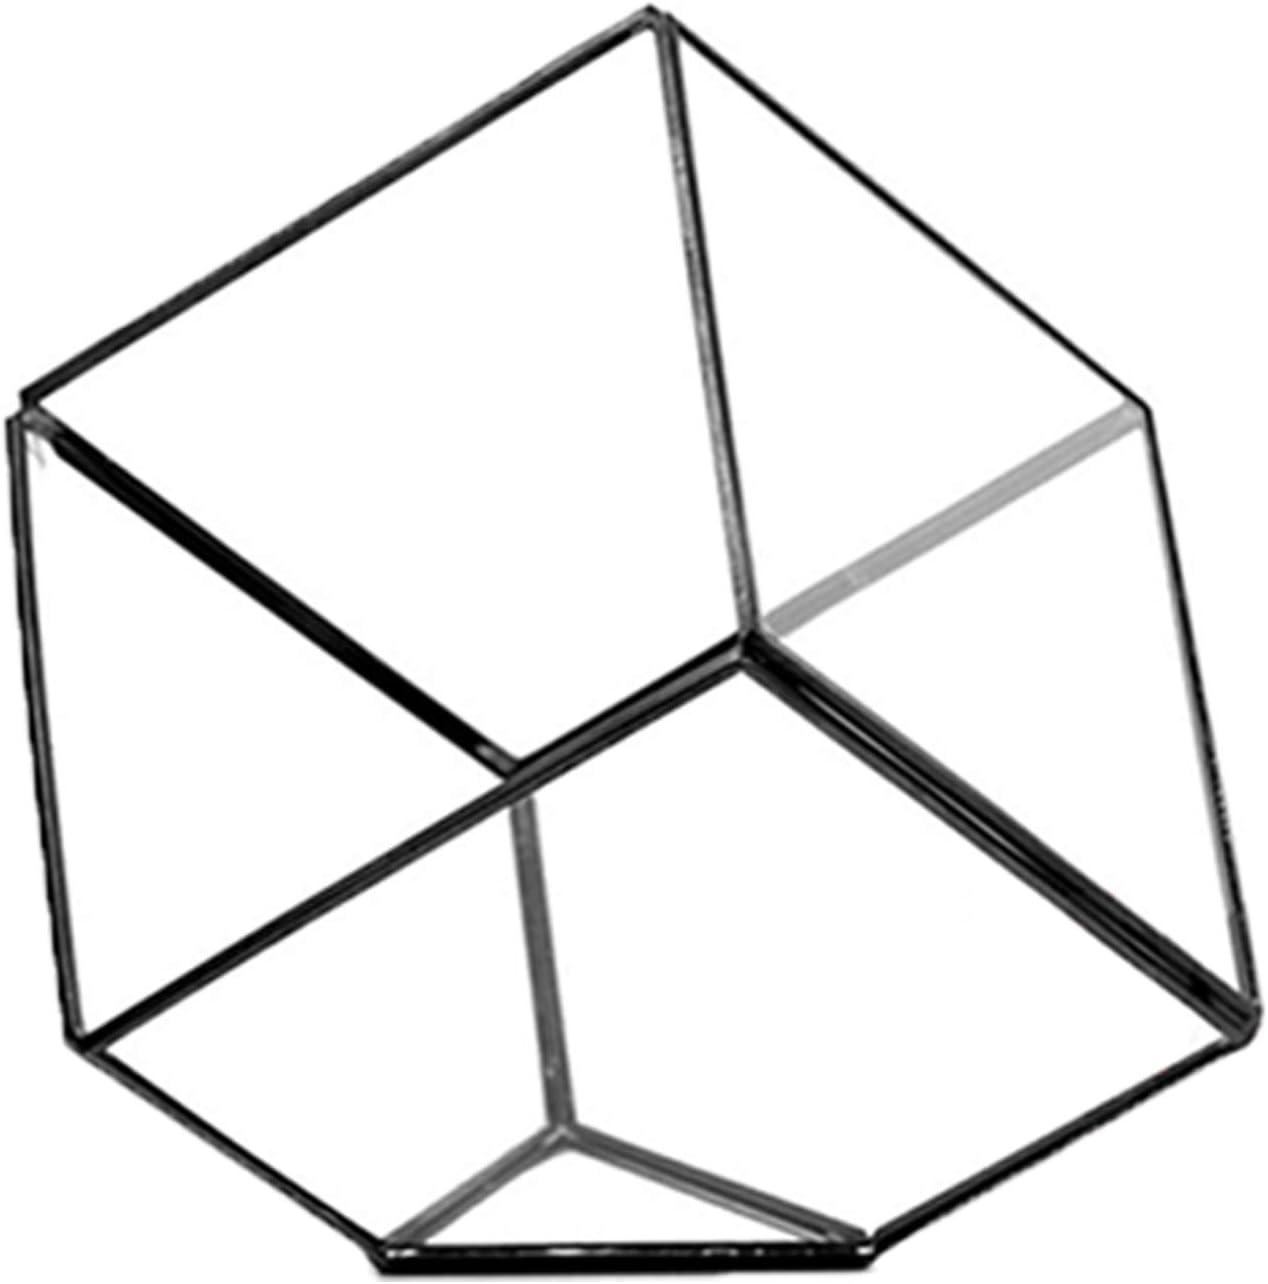 WGV Geometric Planter Terrarium, Width 8